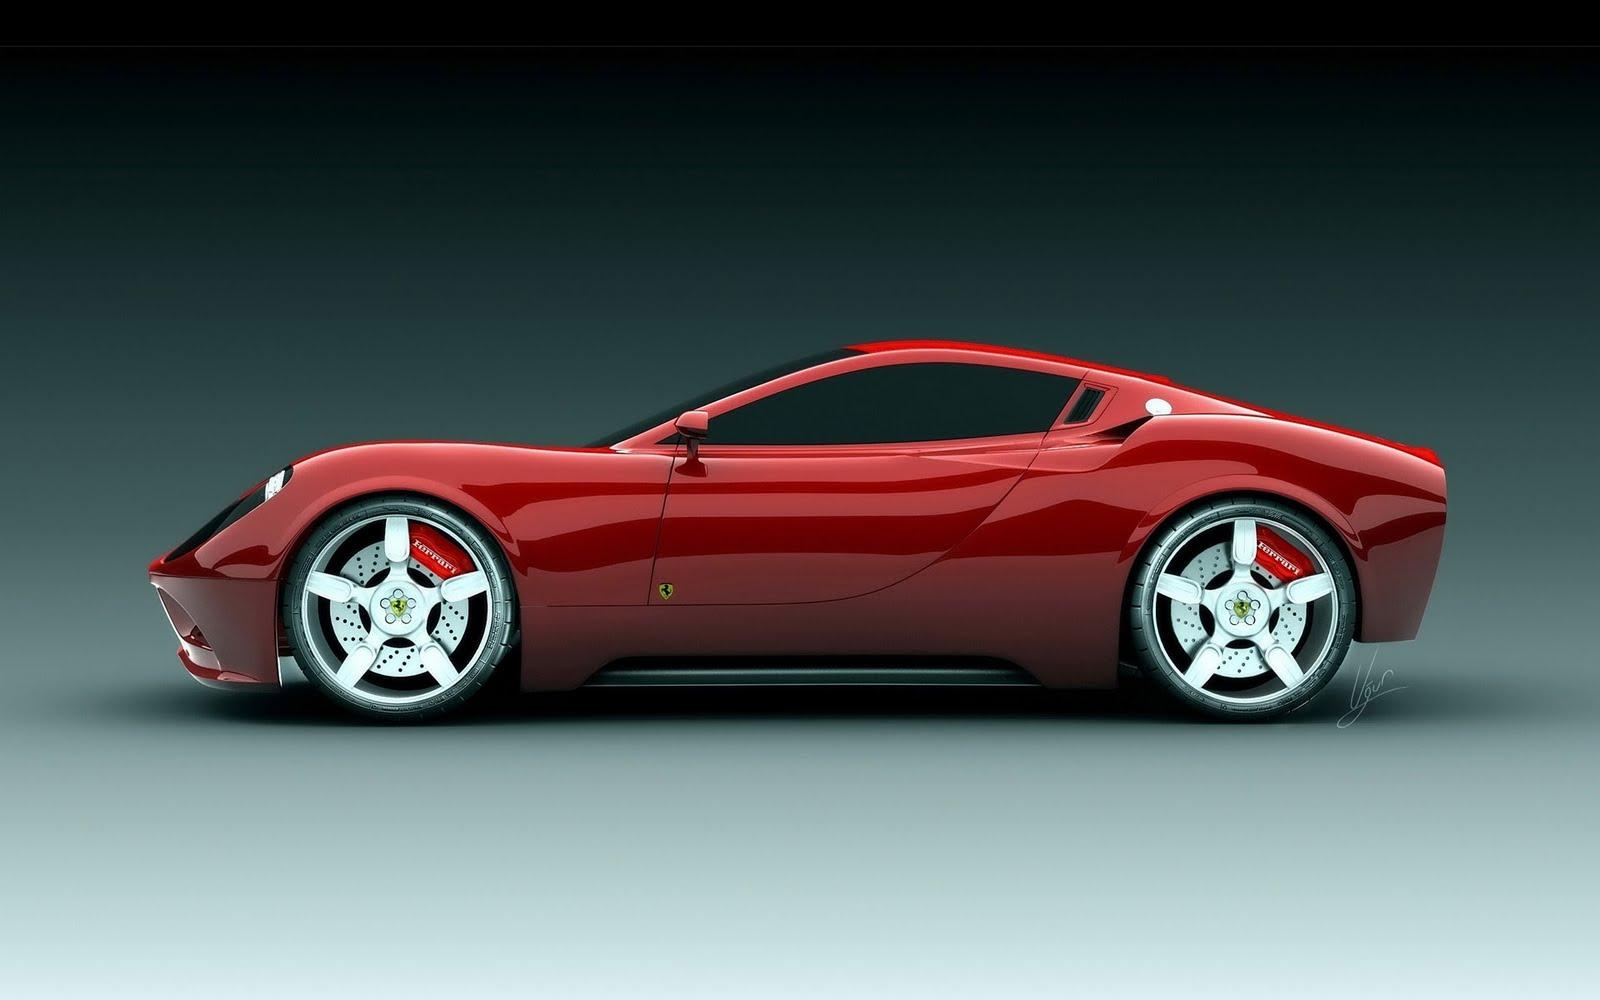 http://2.bp.blogspot.com/_2IU2Nt4rD1k/SxVl0pngGJI/AAAAAAAAAQ8/mbGEqACRUSo/s1600/Ferrari+(31).jpg